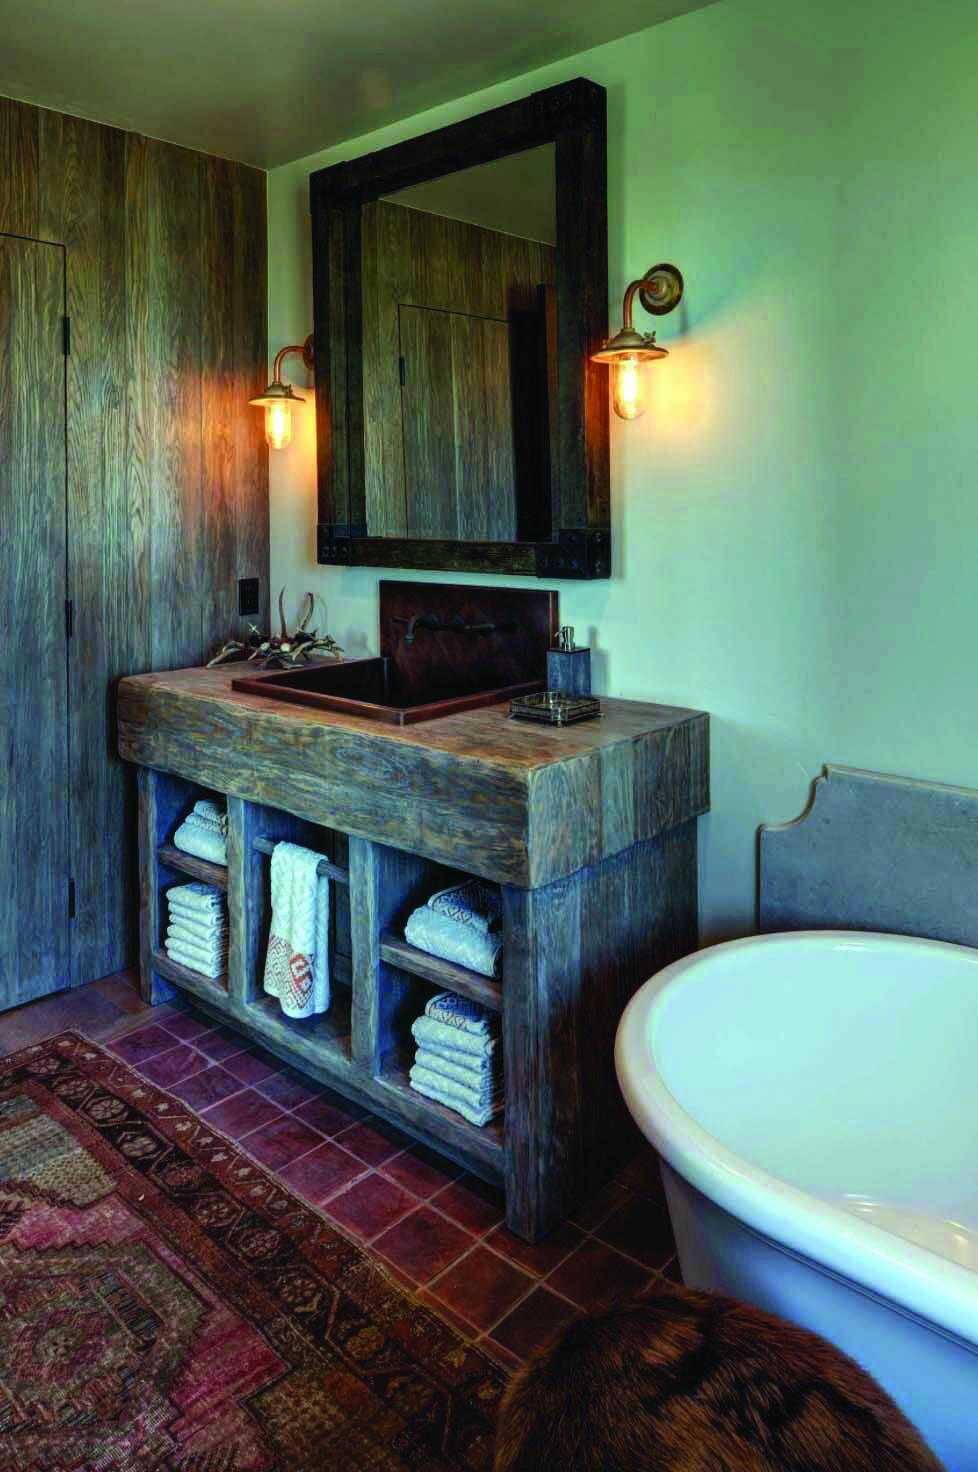 Impressive Rustic Bathroom Vanity Pictures On This Favorite Site